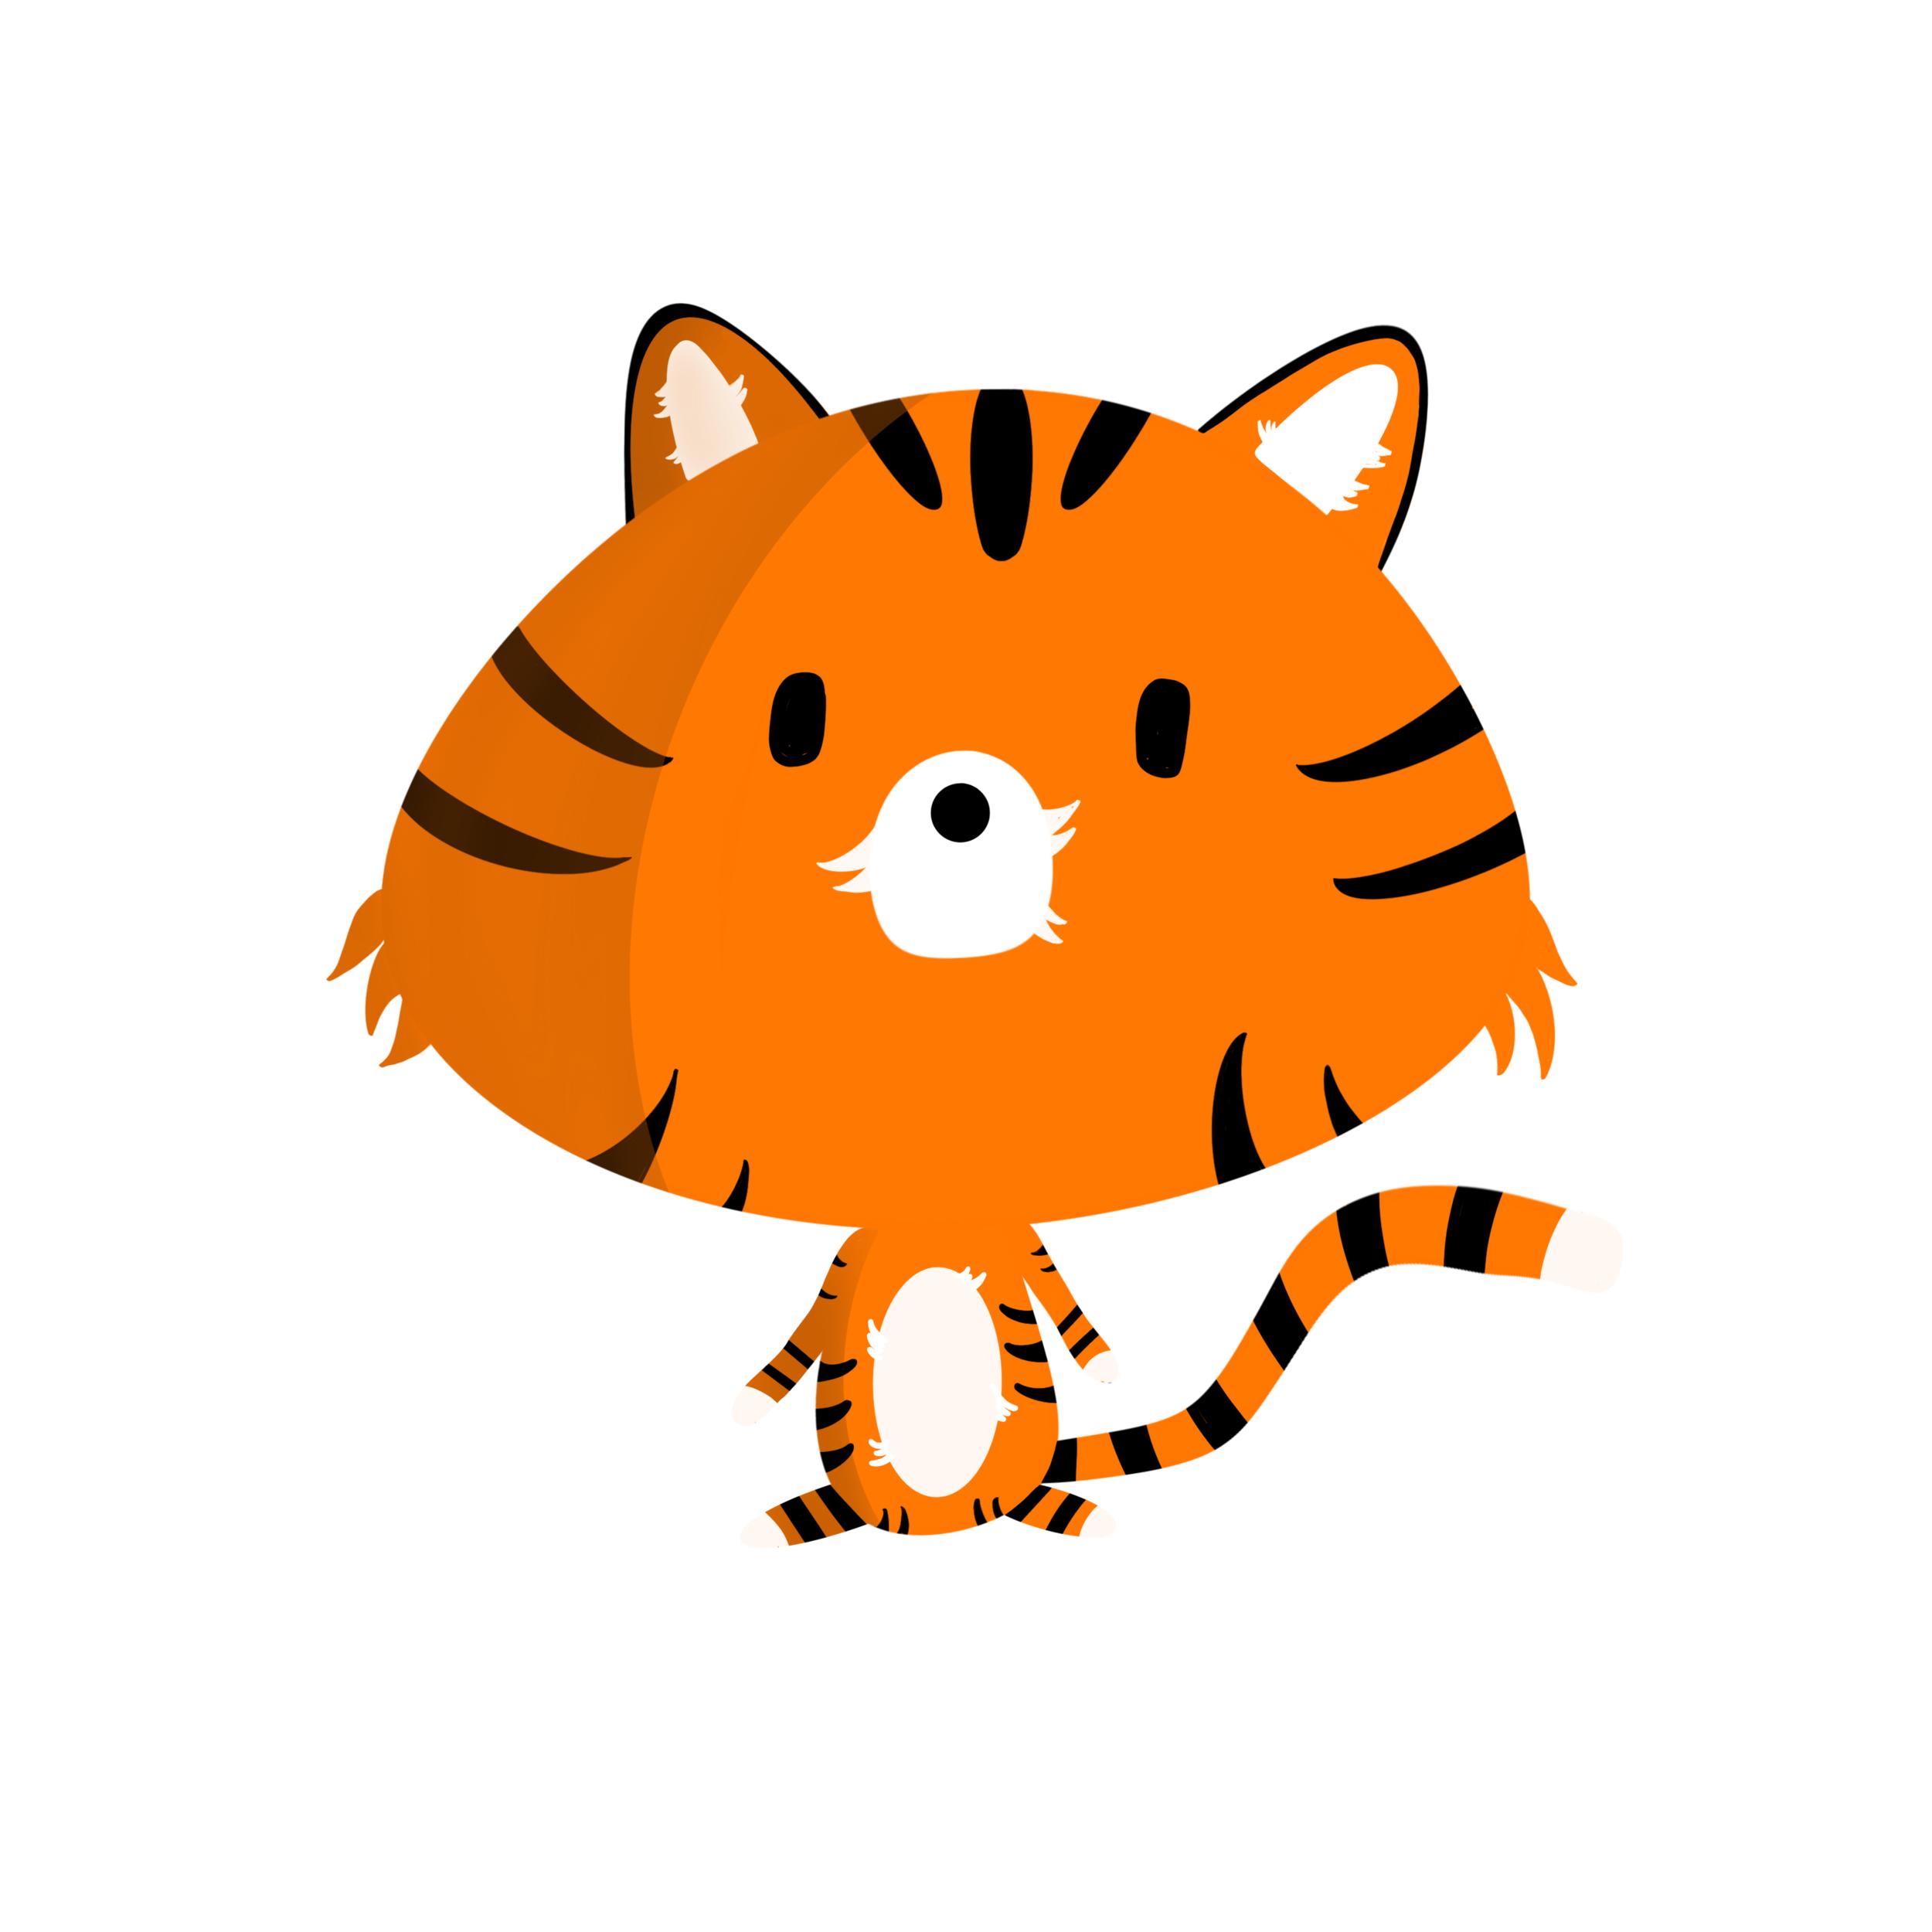 15-tiger-camilla-skotmyr.png